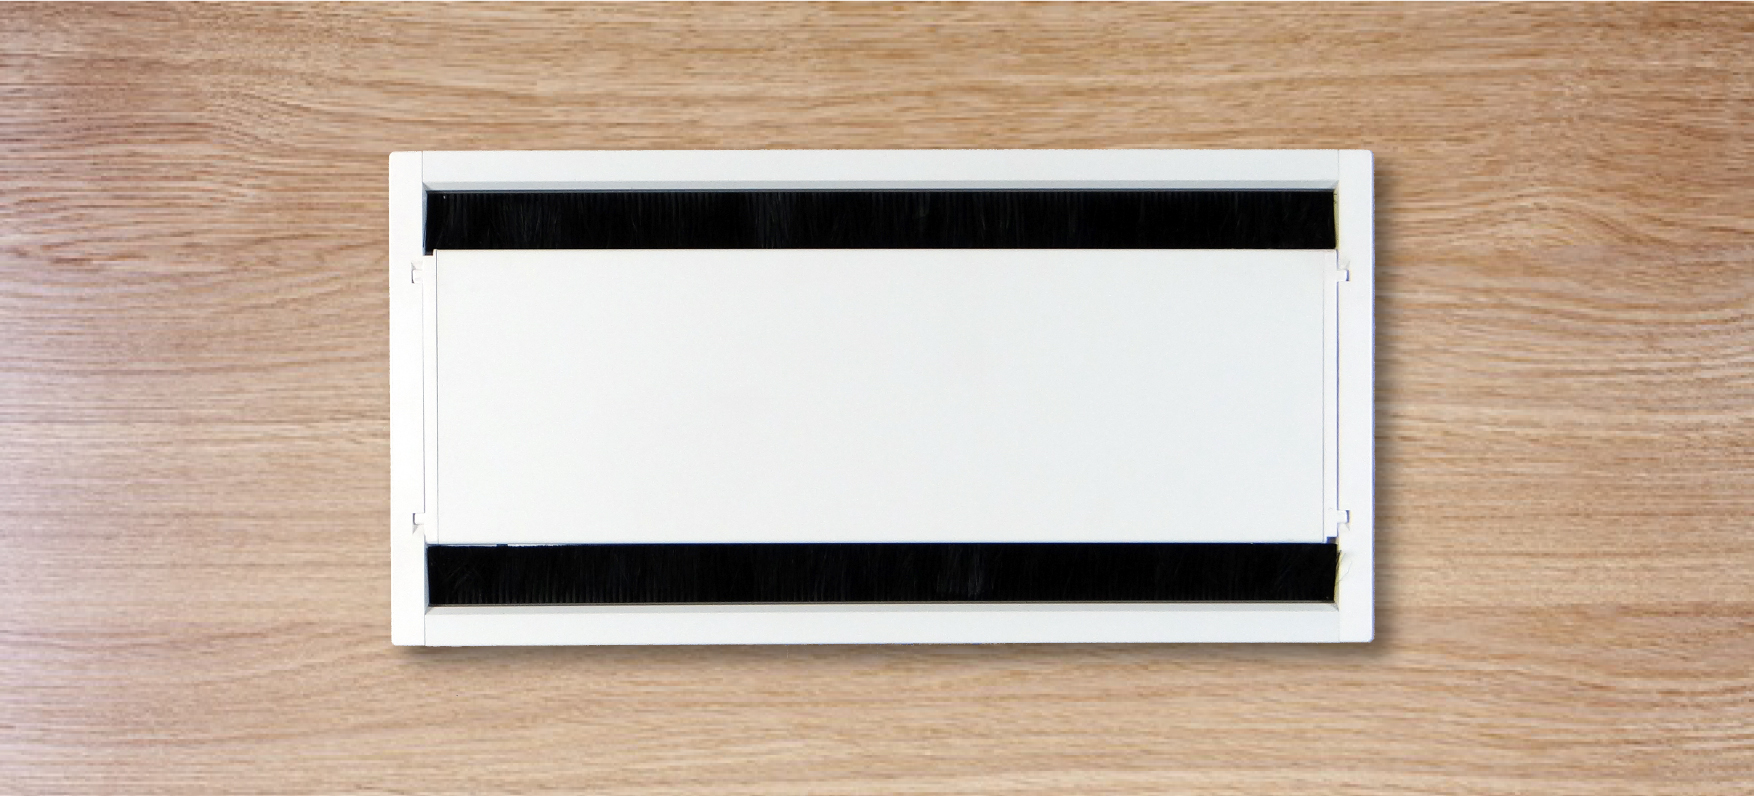 DIGITEL Digitel Conference Mid-Double - Boitier de connexion 5 x 220V, 4 x LAN, 1 x HDMI, 1 x USB3, 1 x VGA - Blanc